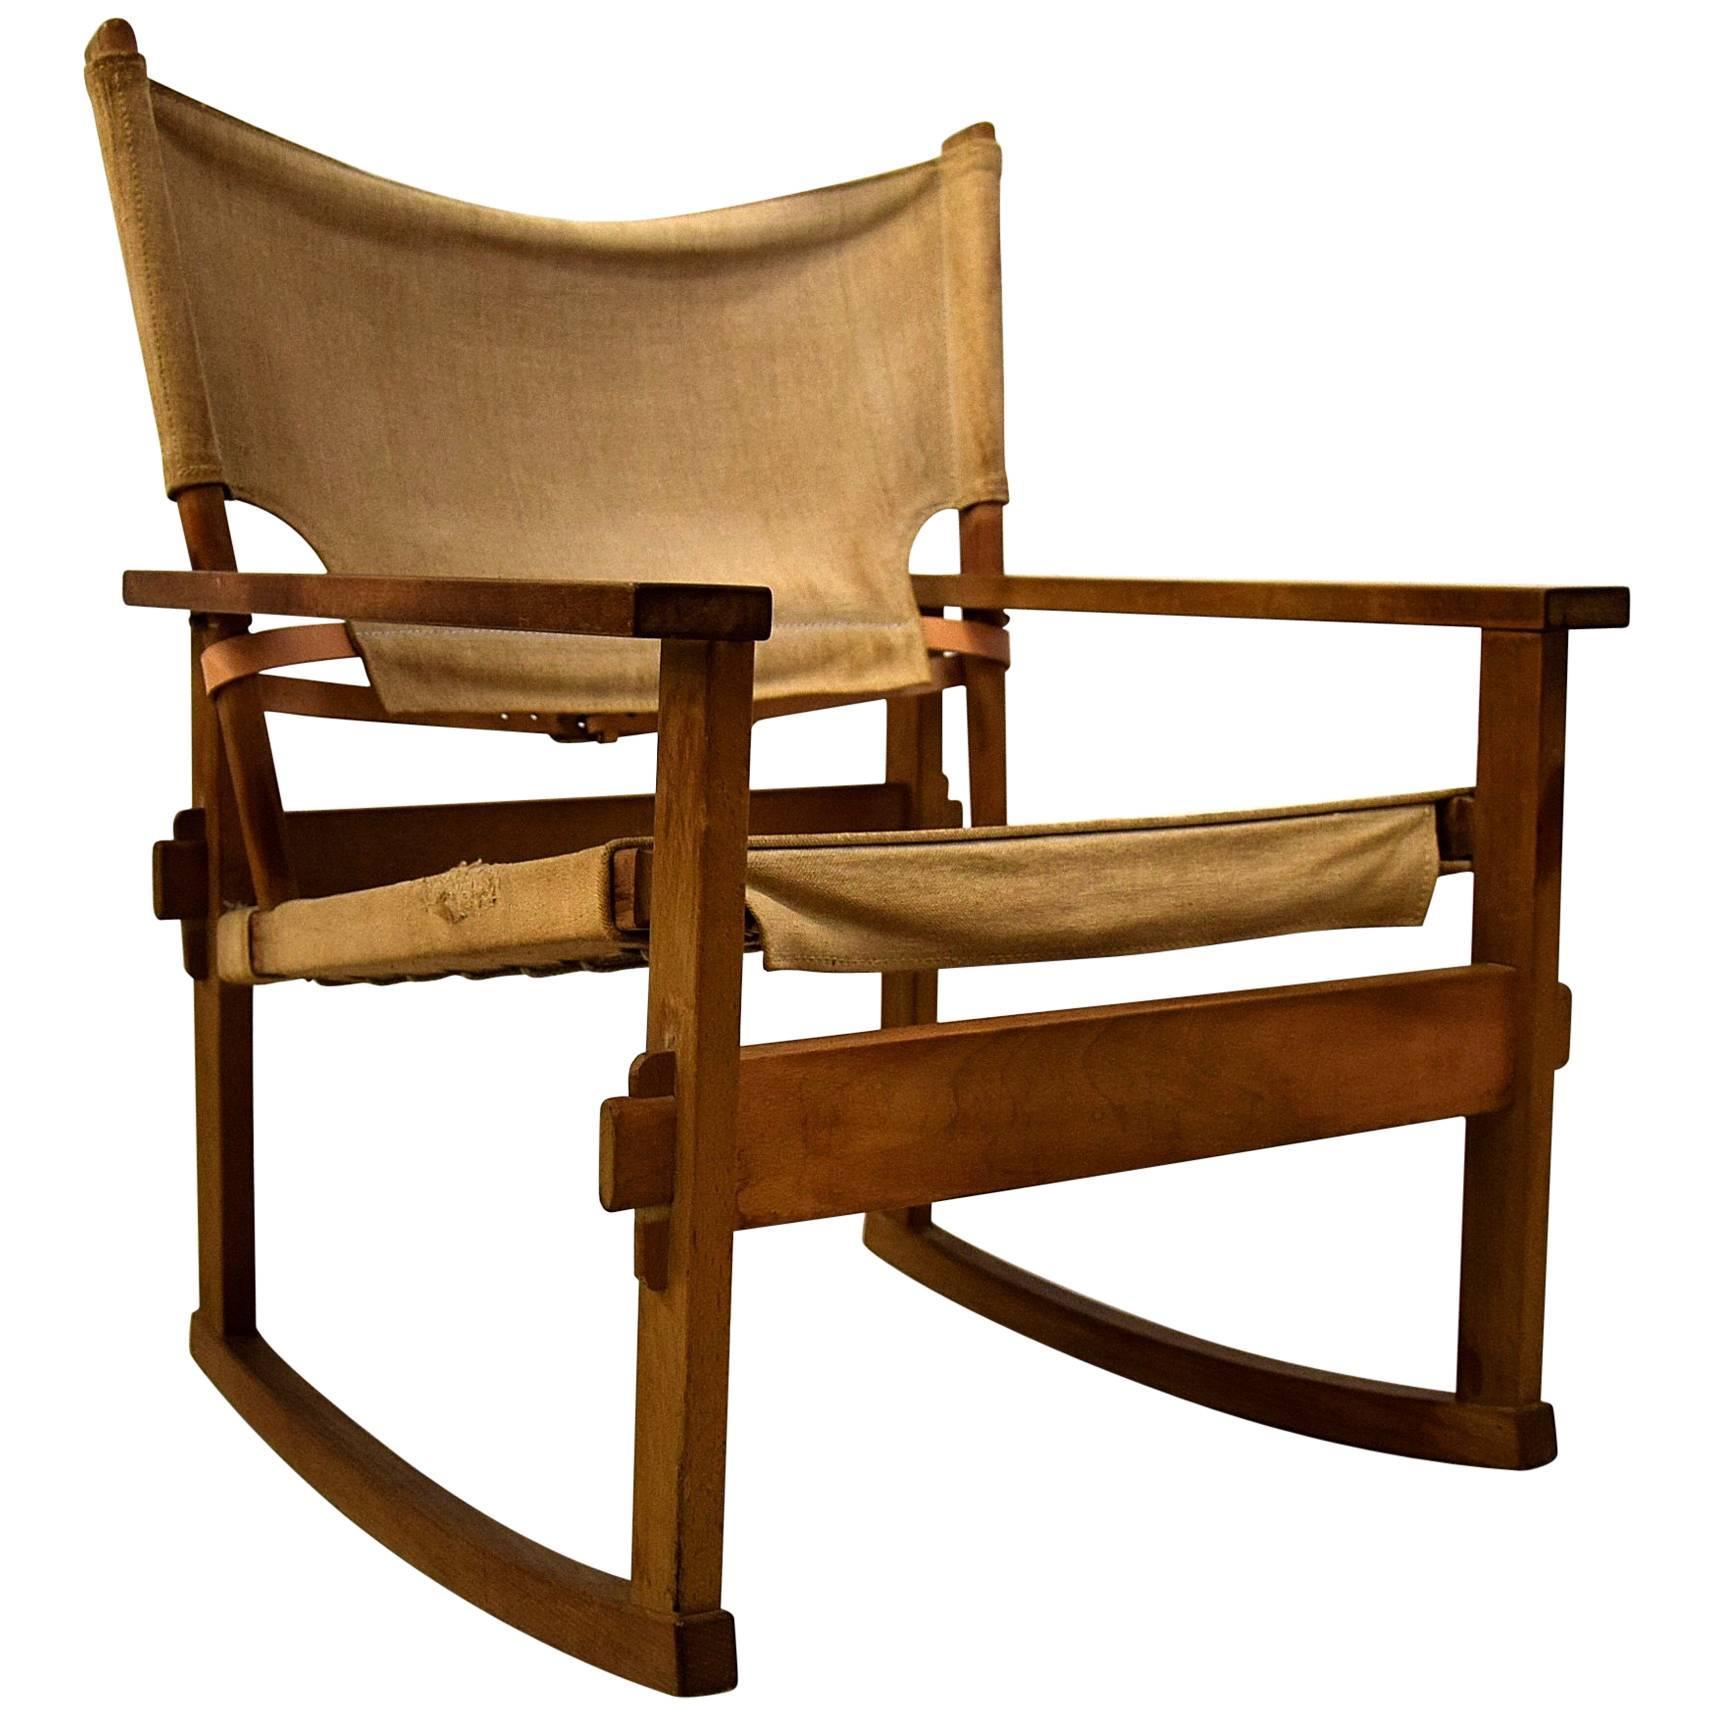 Rare Mid Century modern Poul Hundevad Rocking Chair